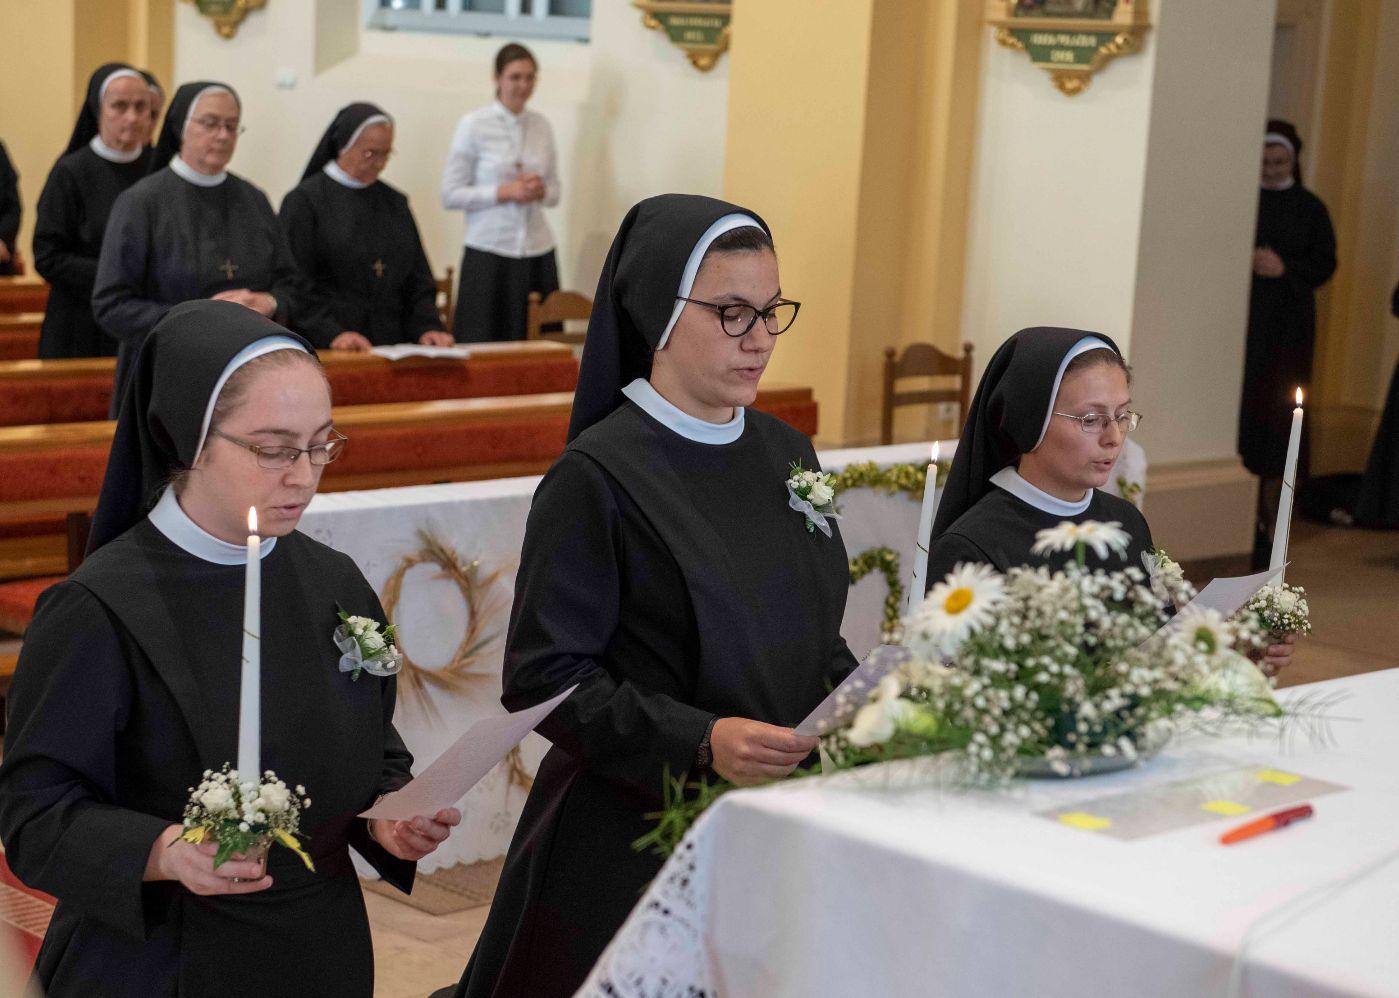 Slavlje Prvih zavjeta sestara u Đakovu